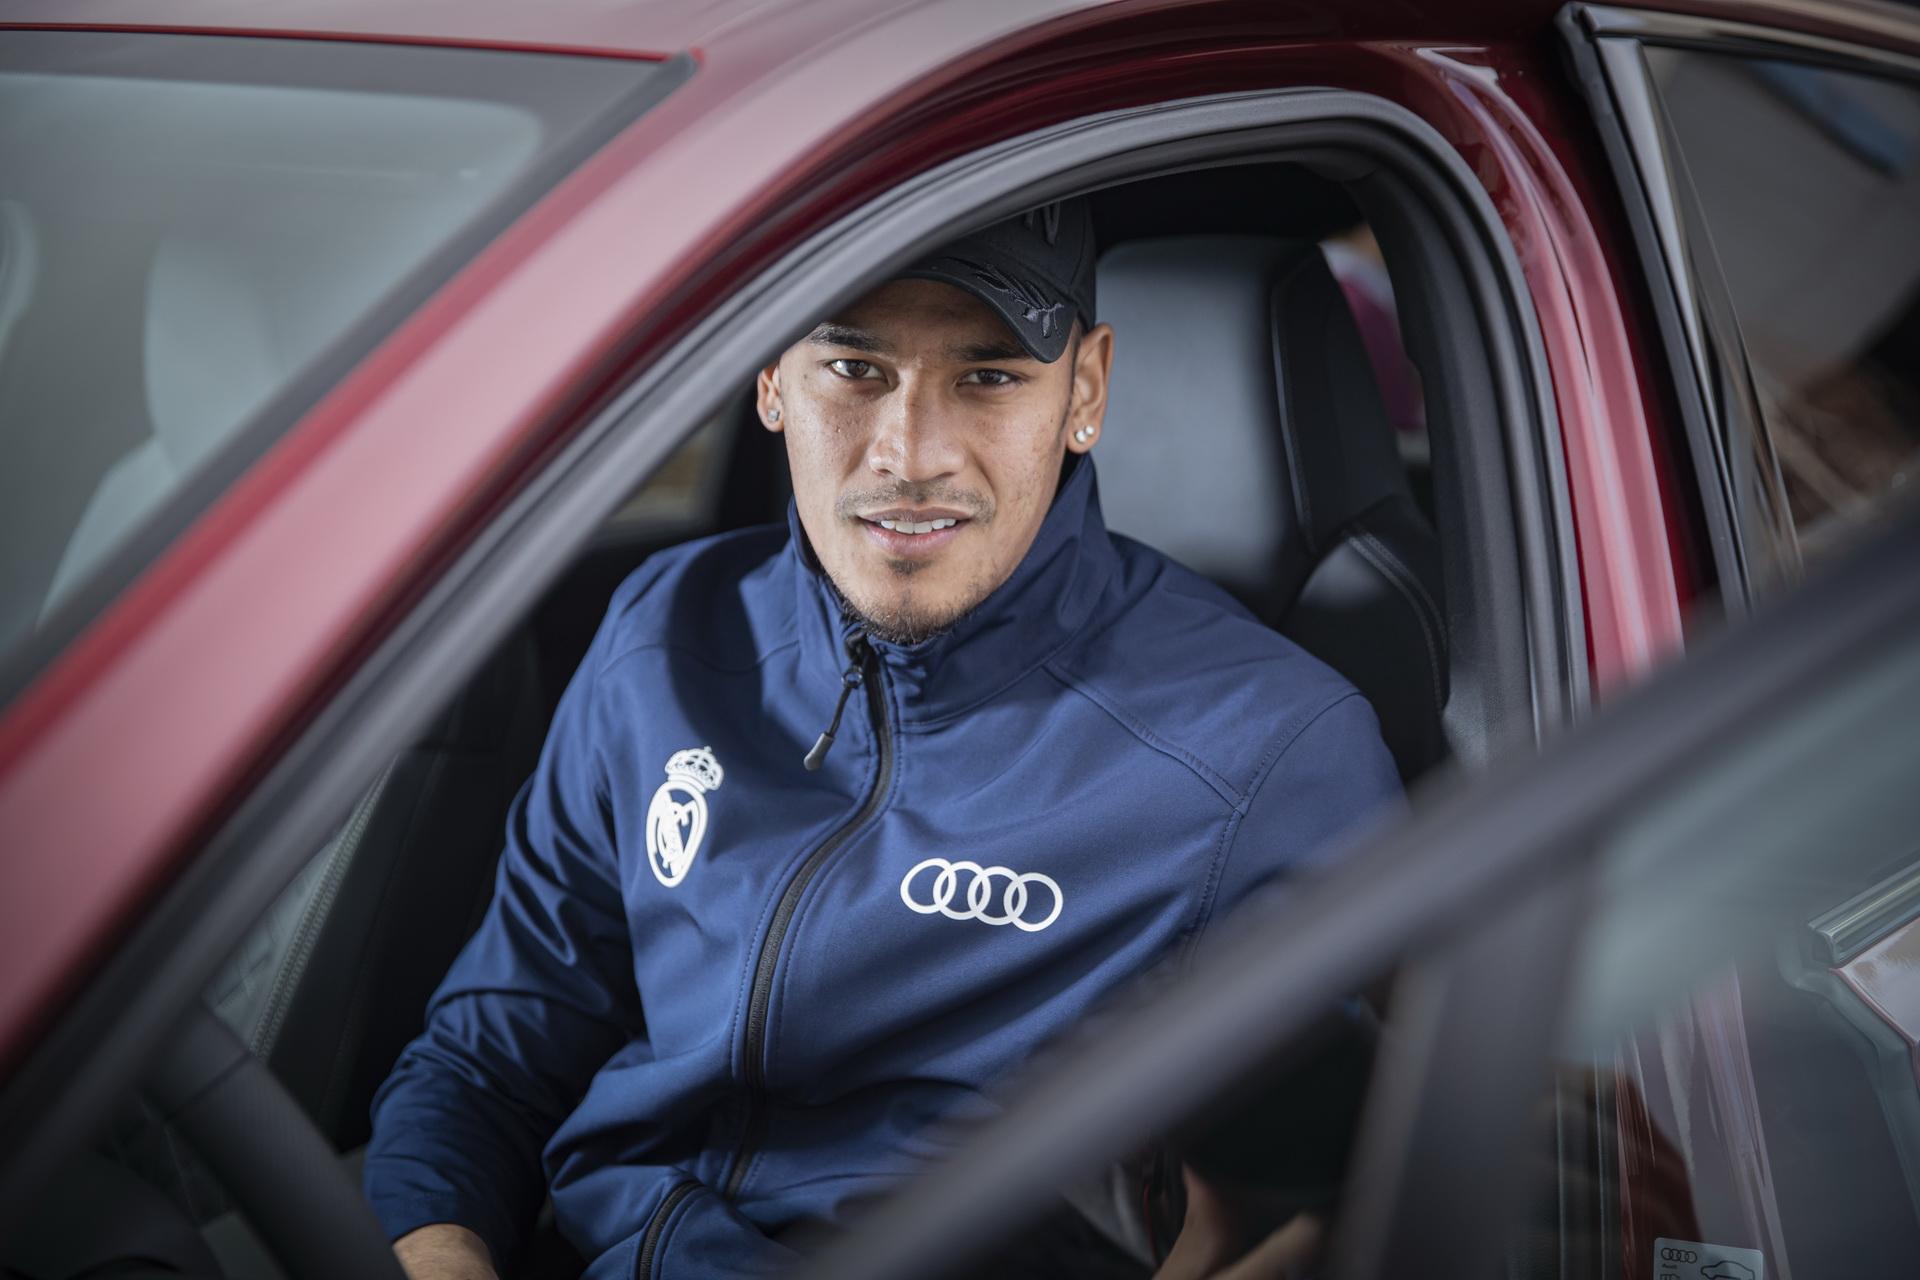 Real_Madrid_Players_Audi_0013